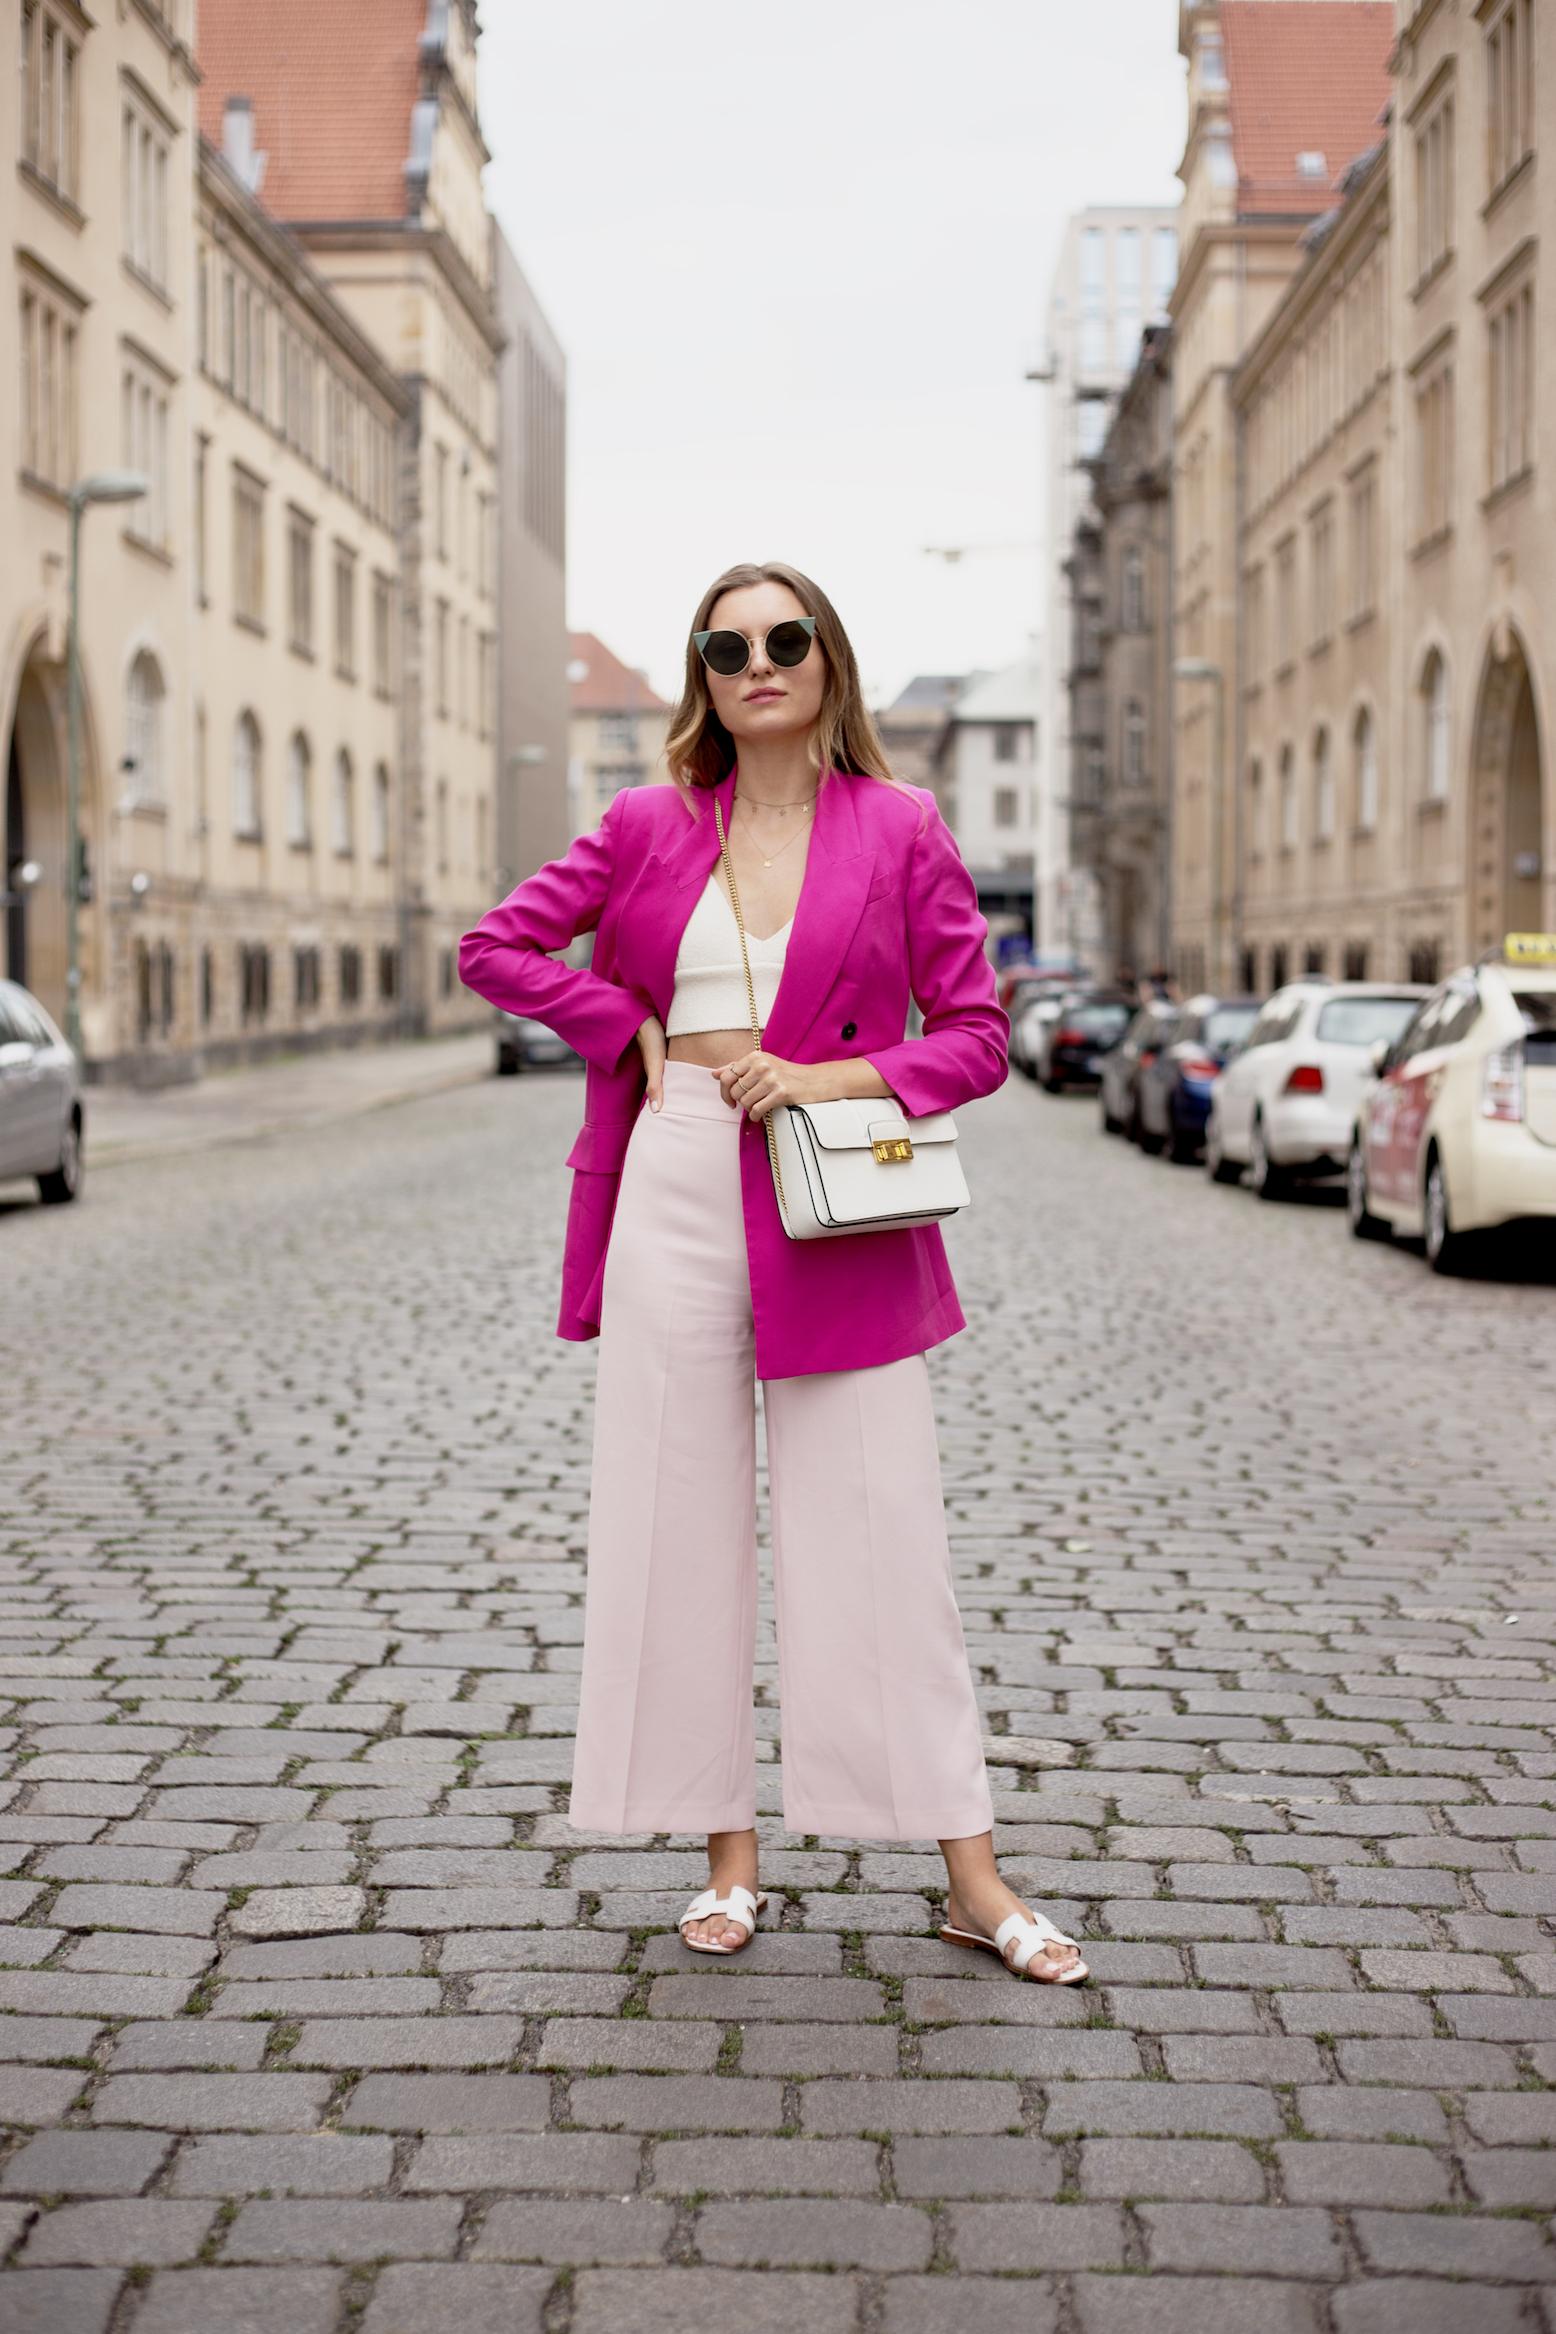 fendi-lei-sunglasses-hermes-oran-livia-auer-IMG_9349